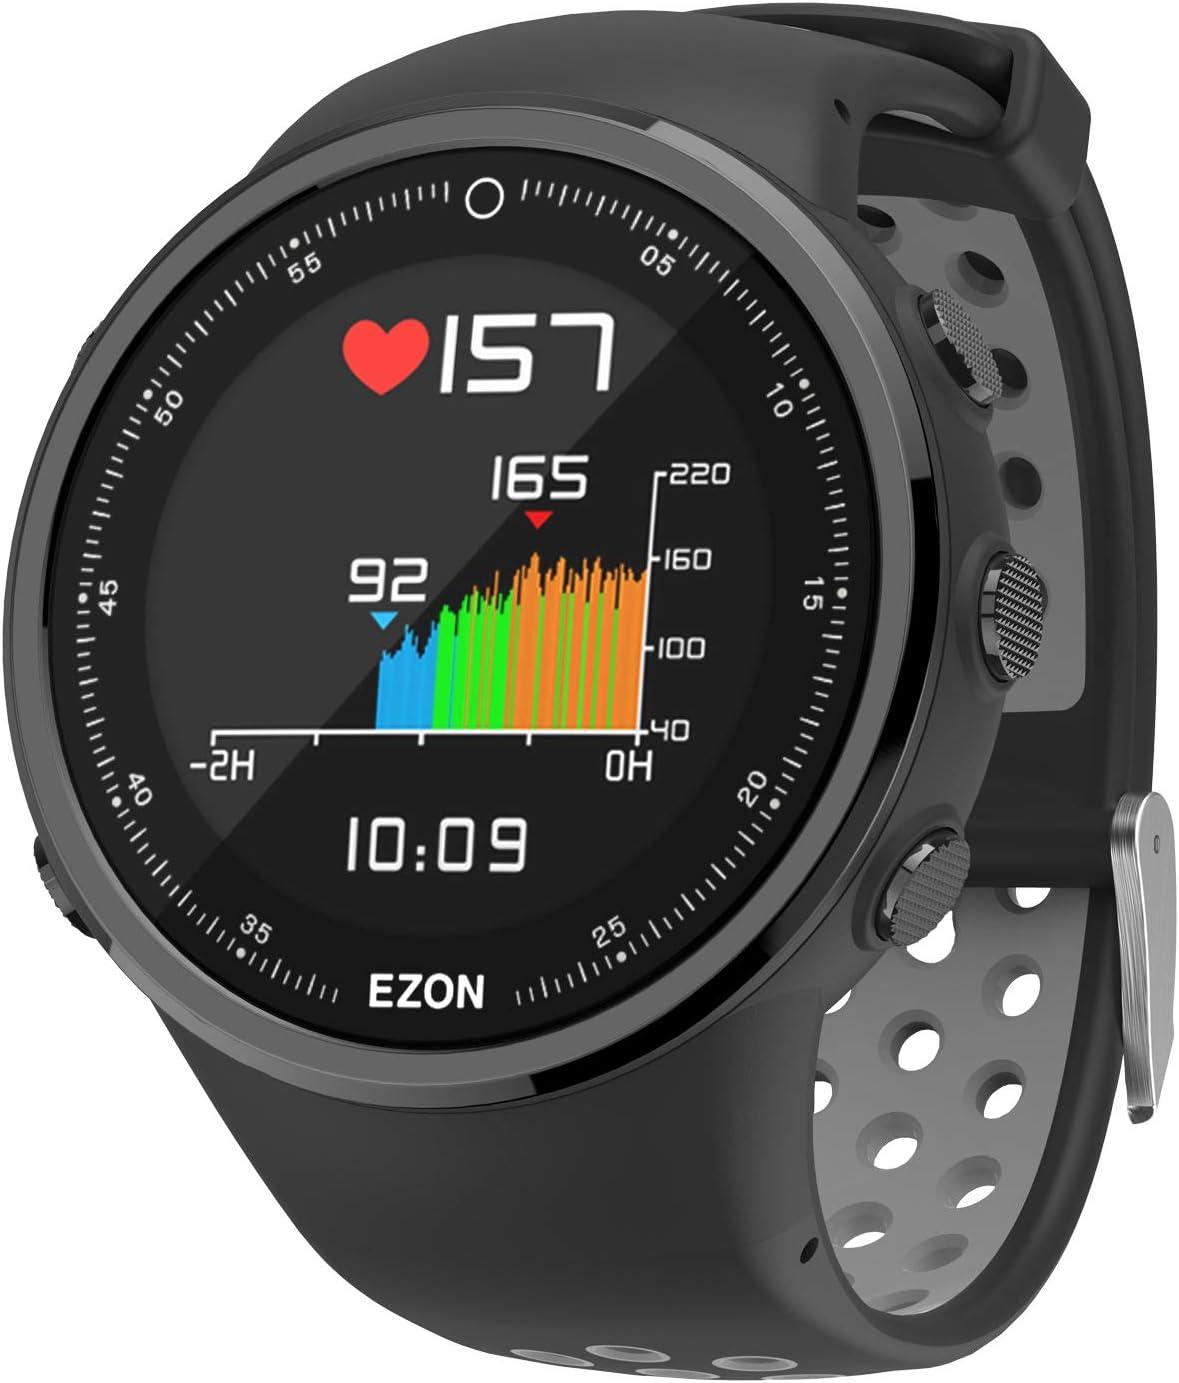 EZON Reloj para Correr con Monitor de Frecuencia Cardíaca GPS para Rastreador de Ejercicios